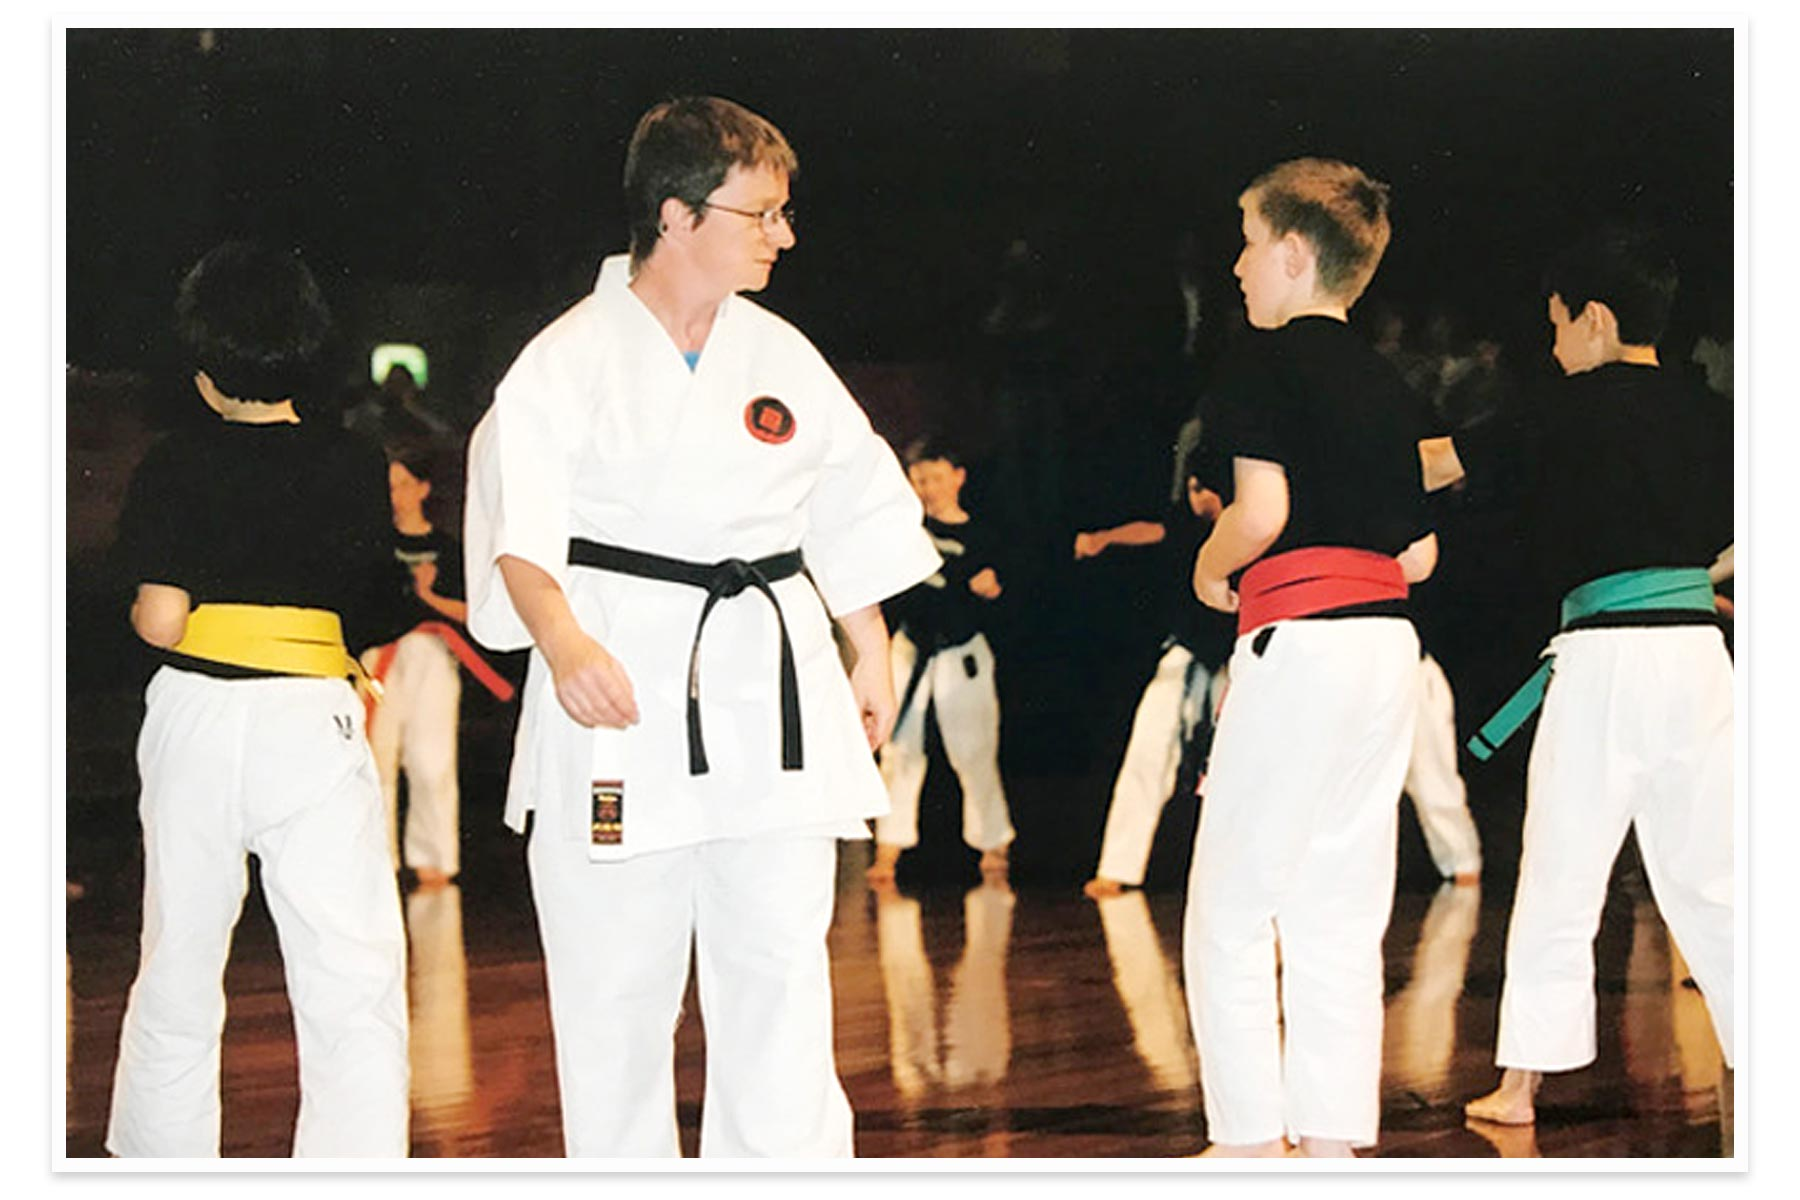 Caroline Manly, Sensei and founder of Shudokan Karate